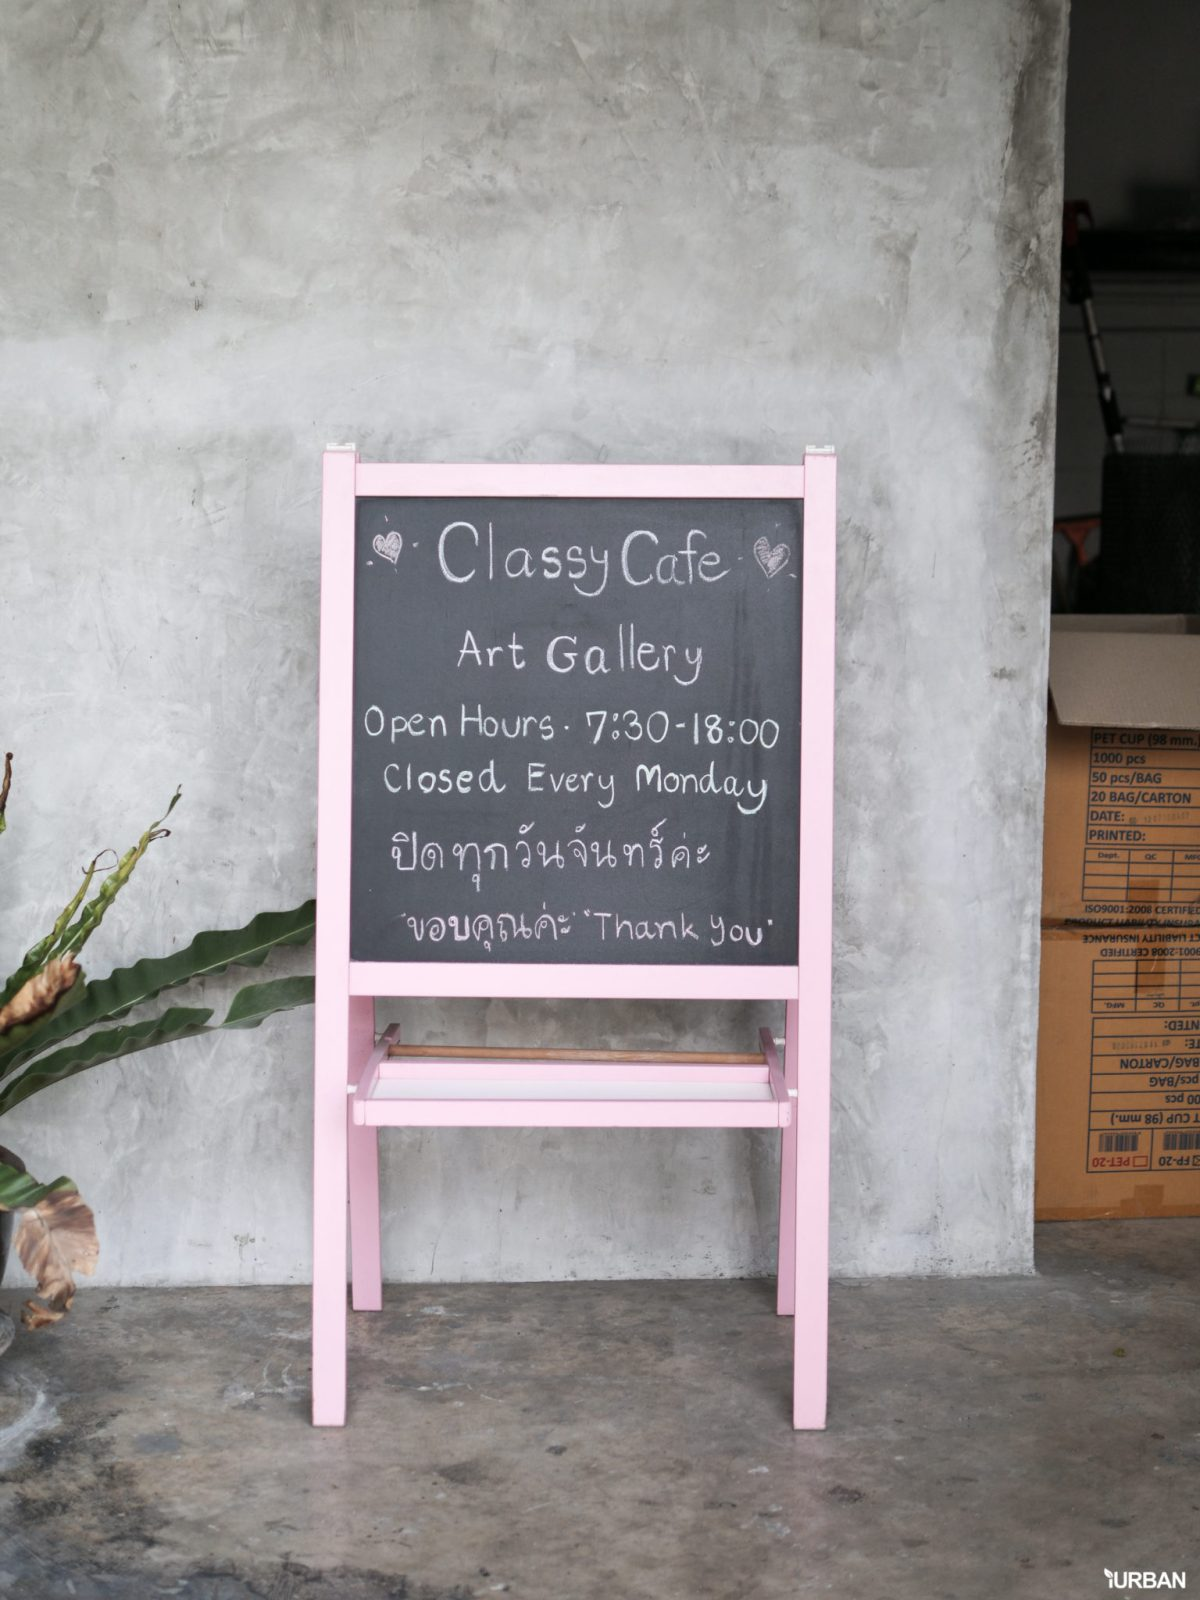 "7 Simply Creative Cafe & Bar ในย่านไลฟ์สไลต์สุดฮิป กับ 24 Hr. Co-Working Space กลาง New Interchange ""รัชดา - ลาดพร้าว"" 54 - cafe"